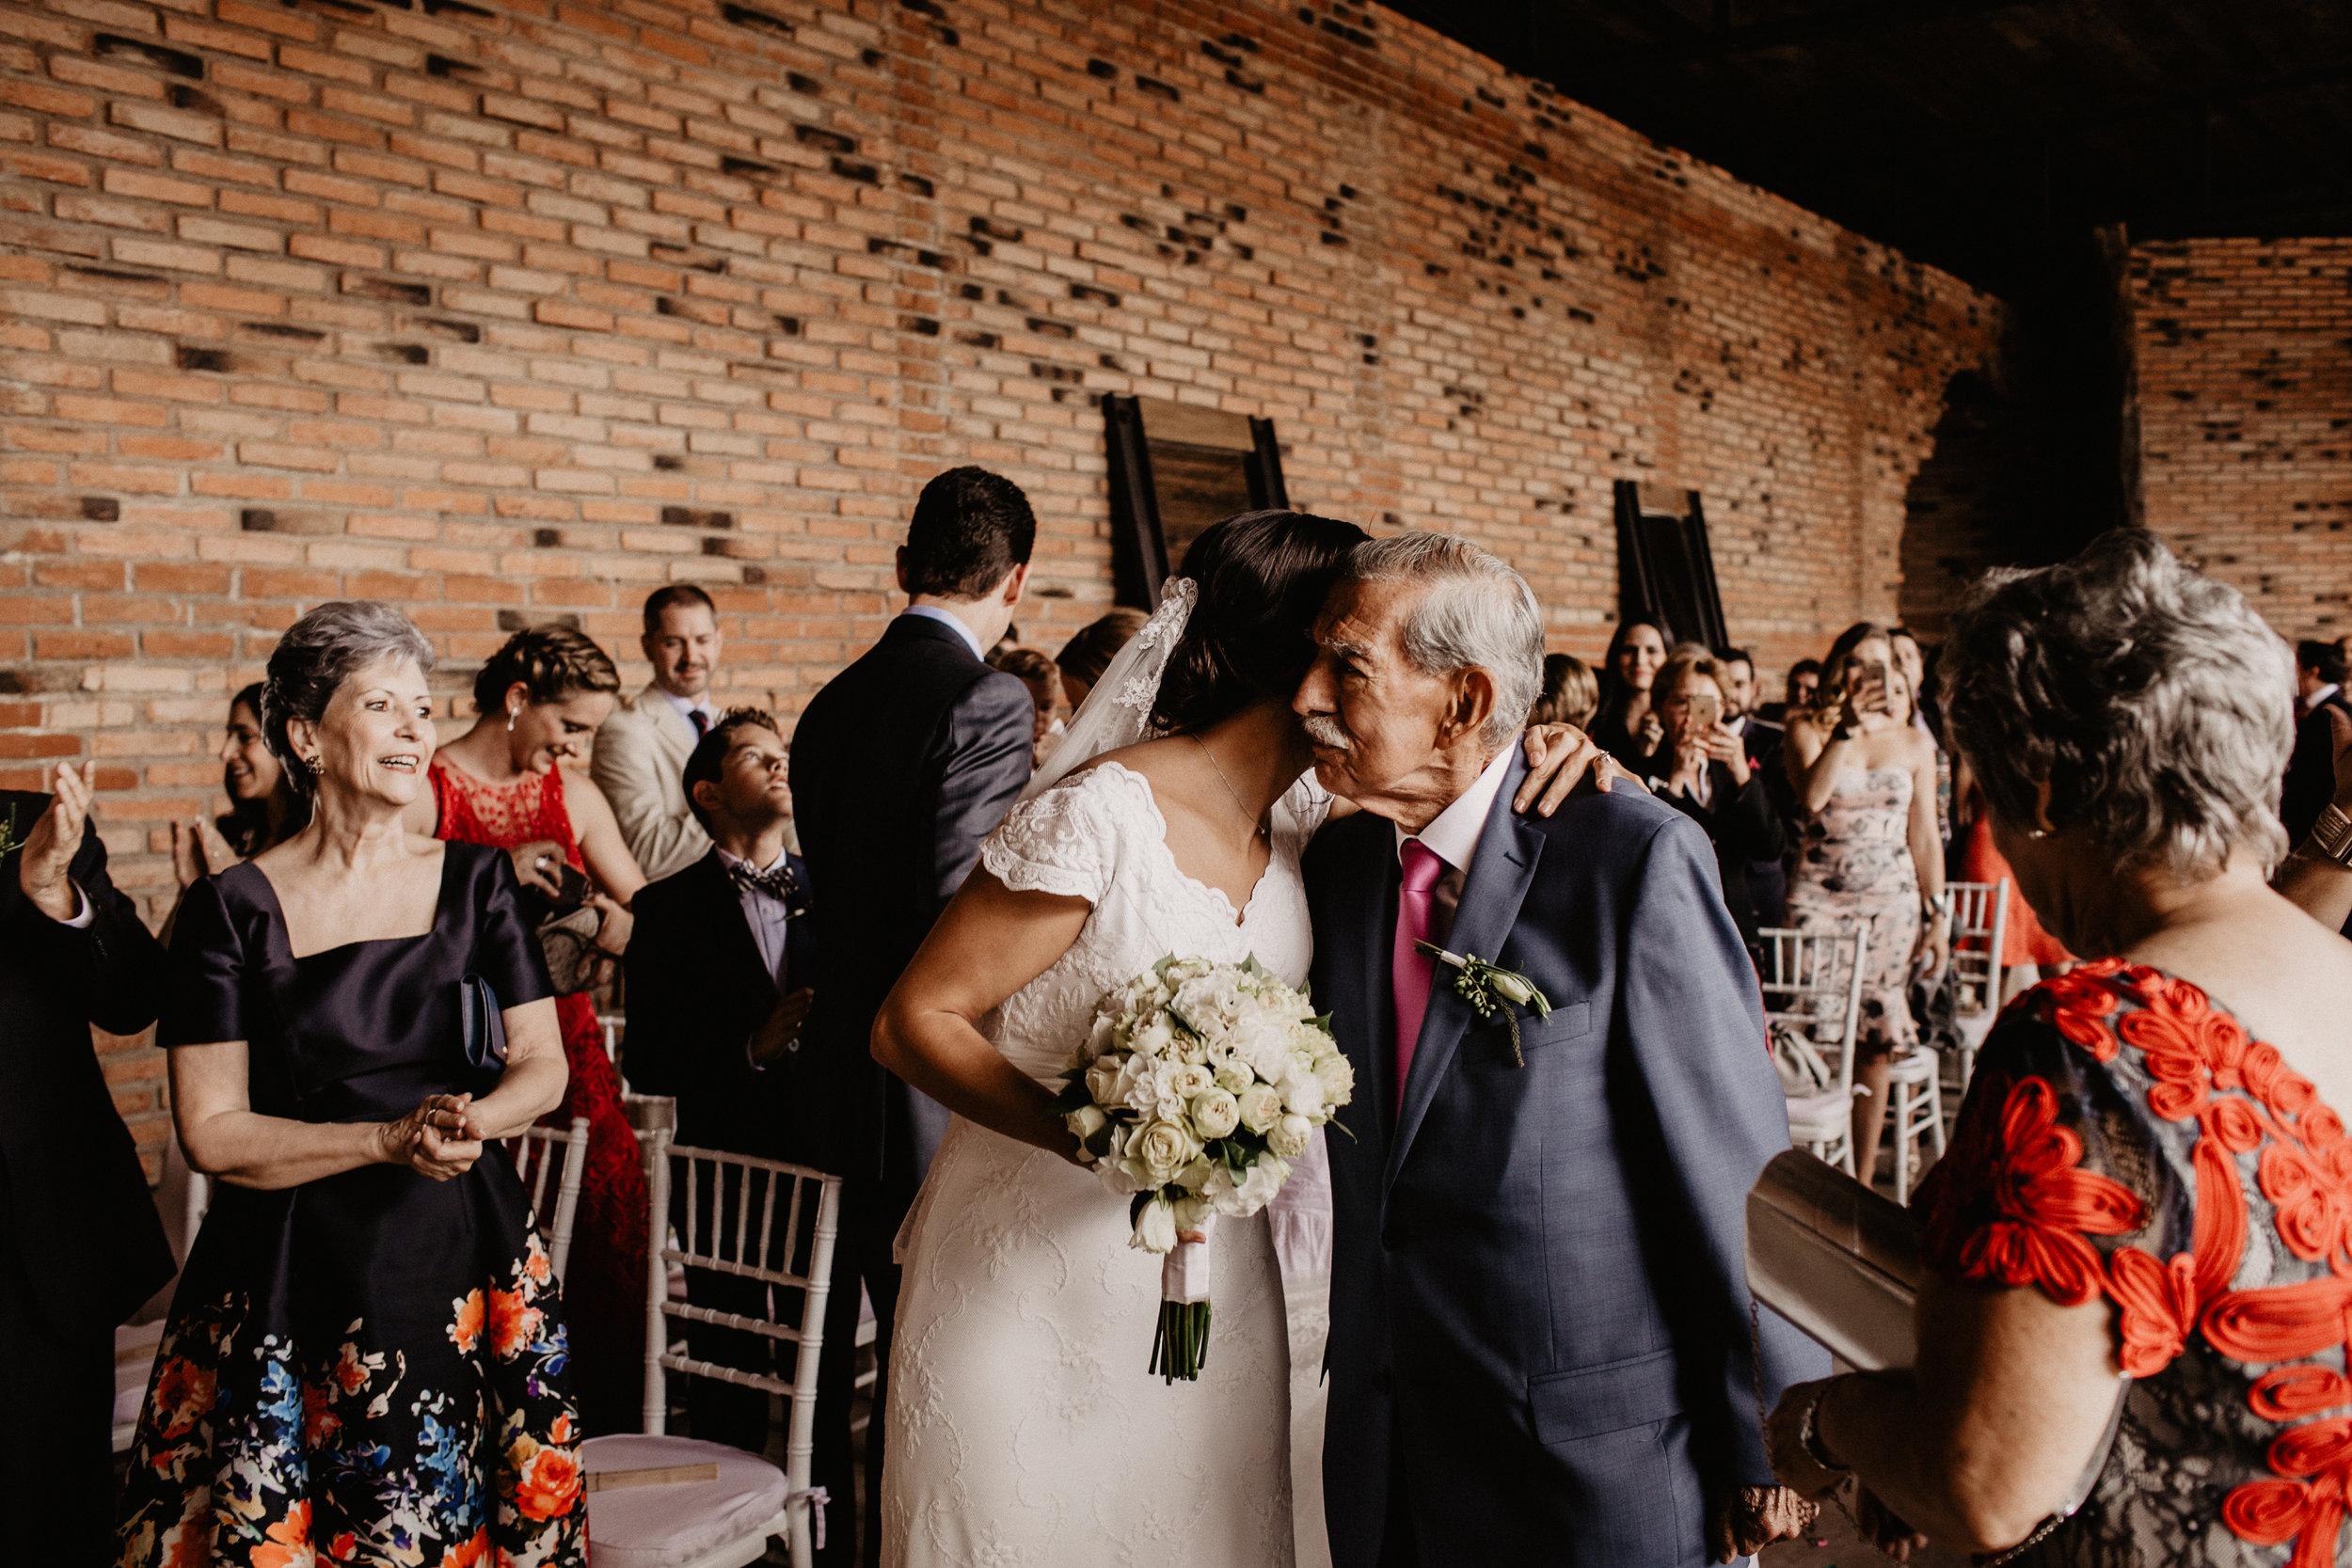 alfonso_flores_destination_wedding_photographer_pau_alonso_371.JPG